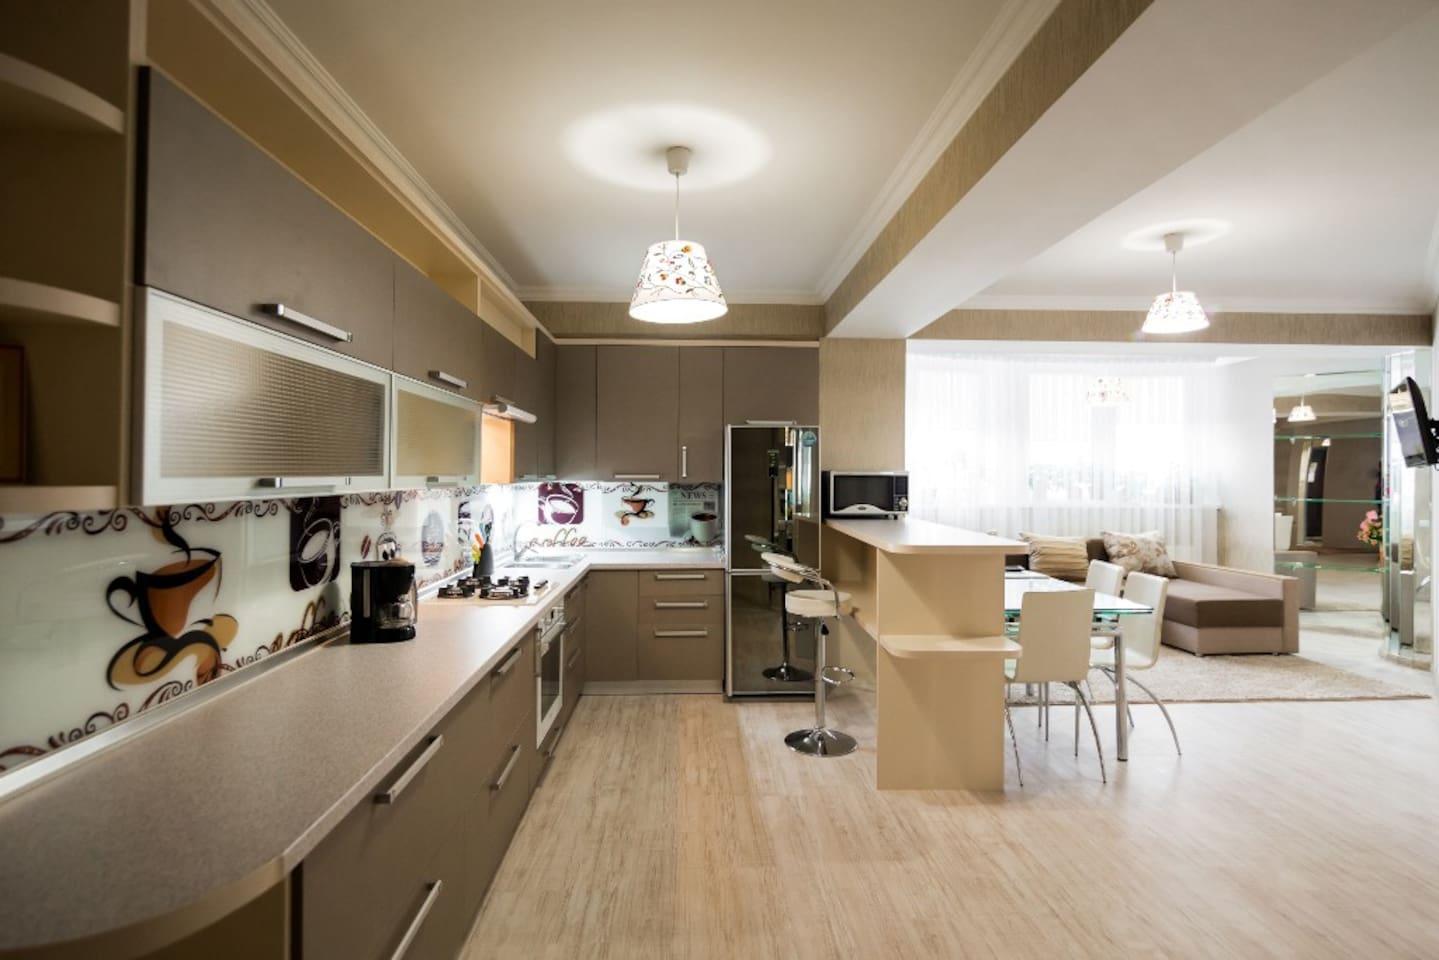 Kitchen area studio with living